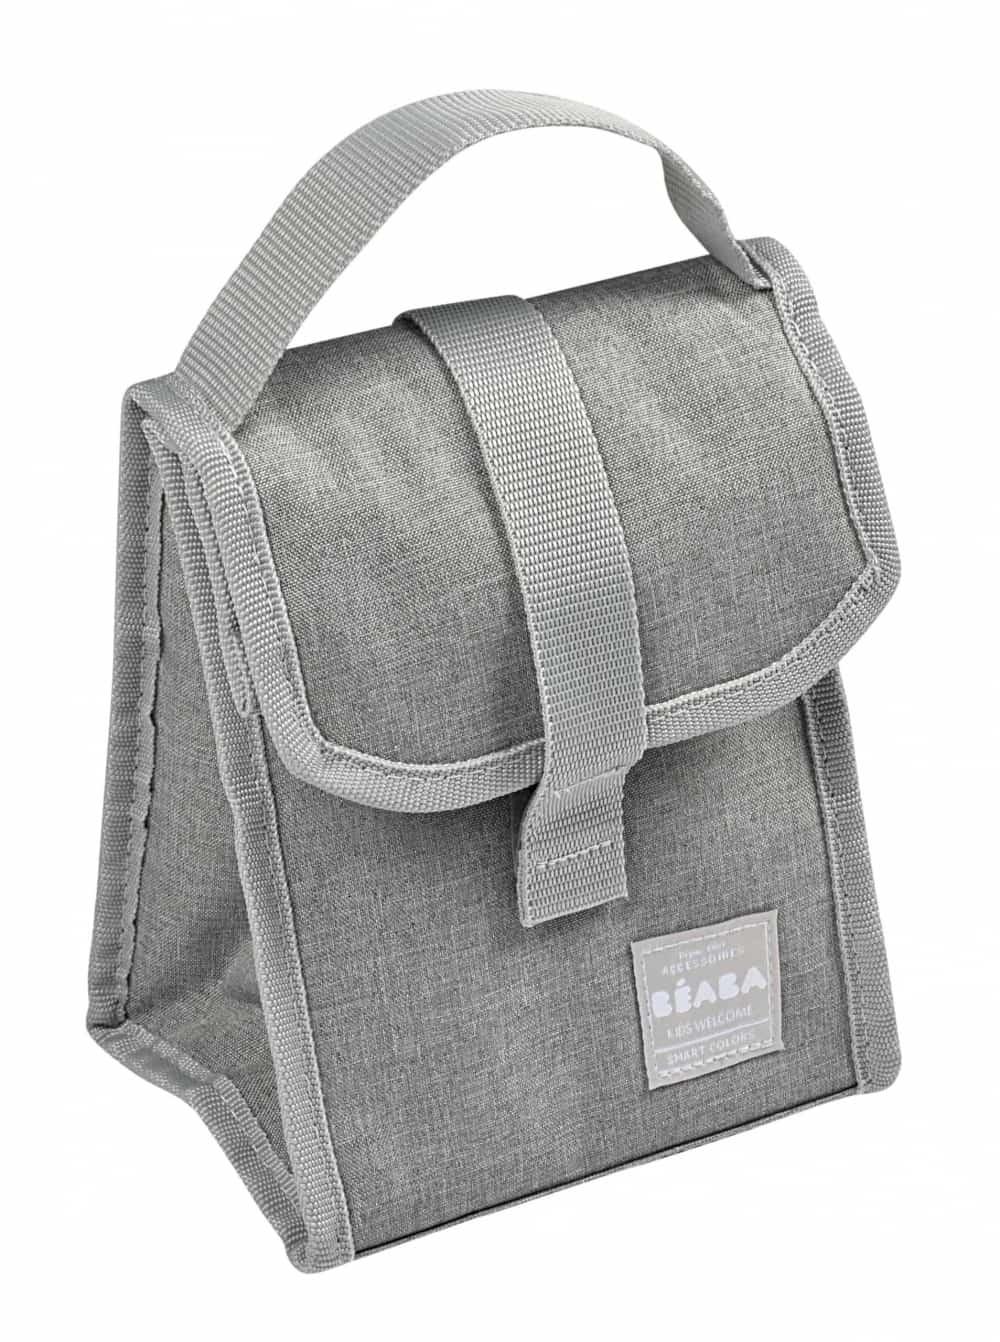 Beaba Must Have Modern Diaper Bag insulated bag